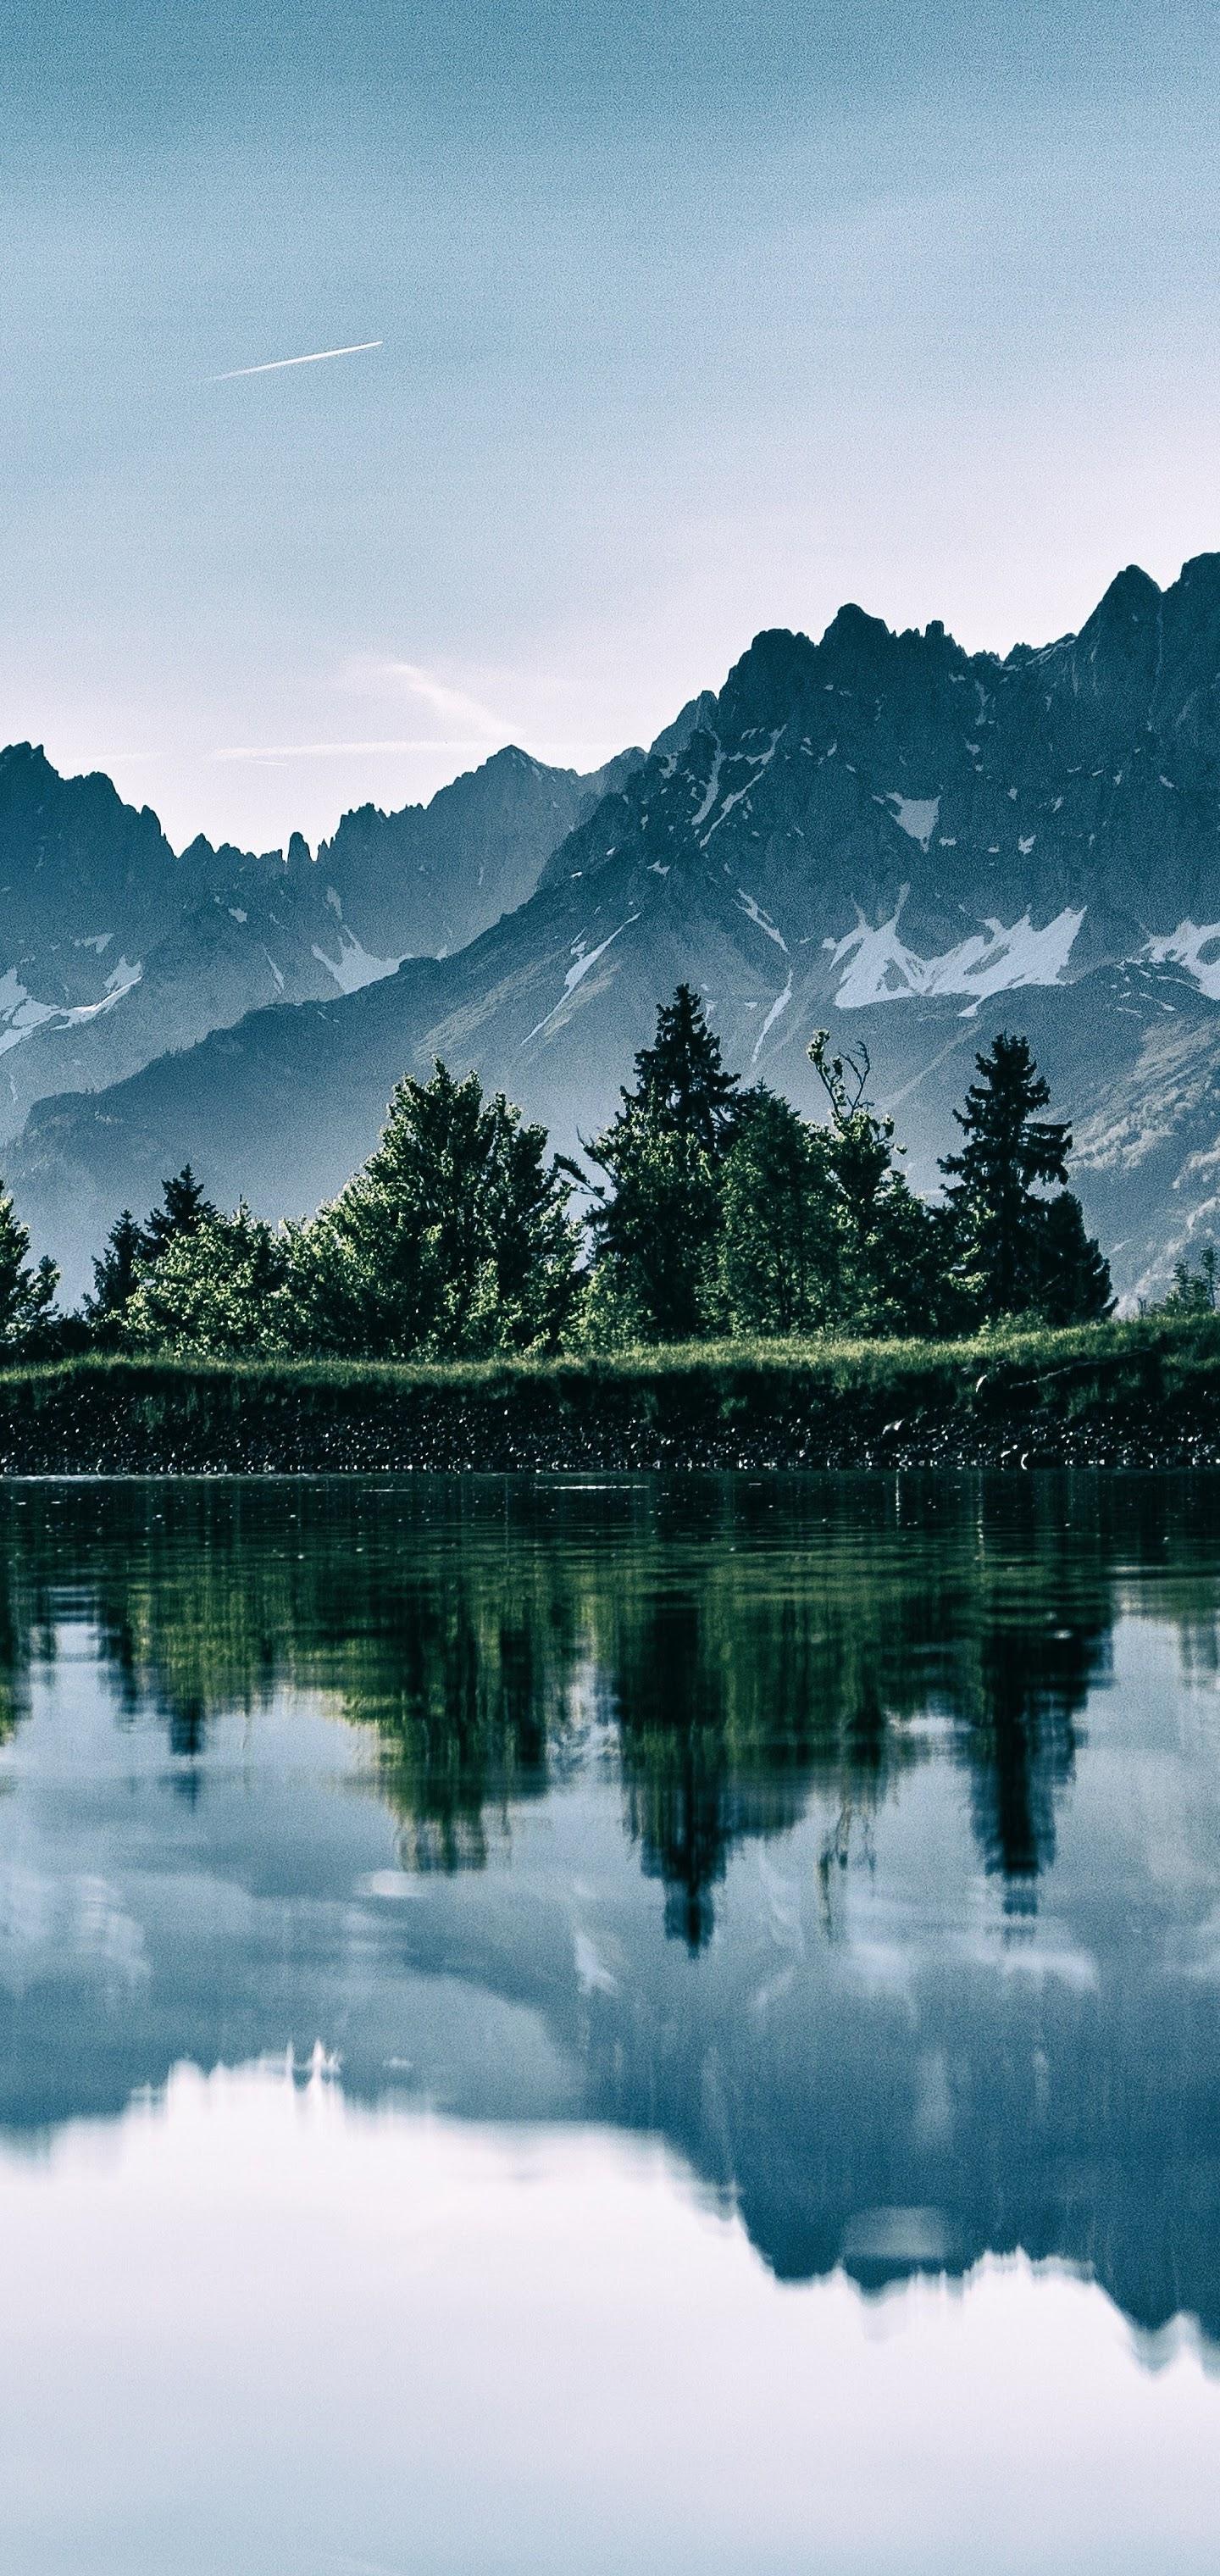 Mountain, Landscape, Trees, Nature, Scenery, 8k, - Mountain Color Palette - HD Wallpaper